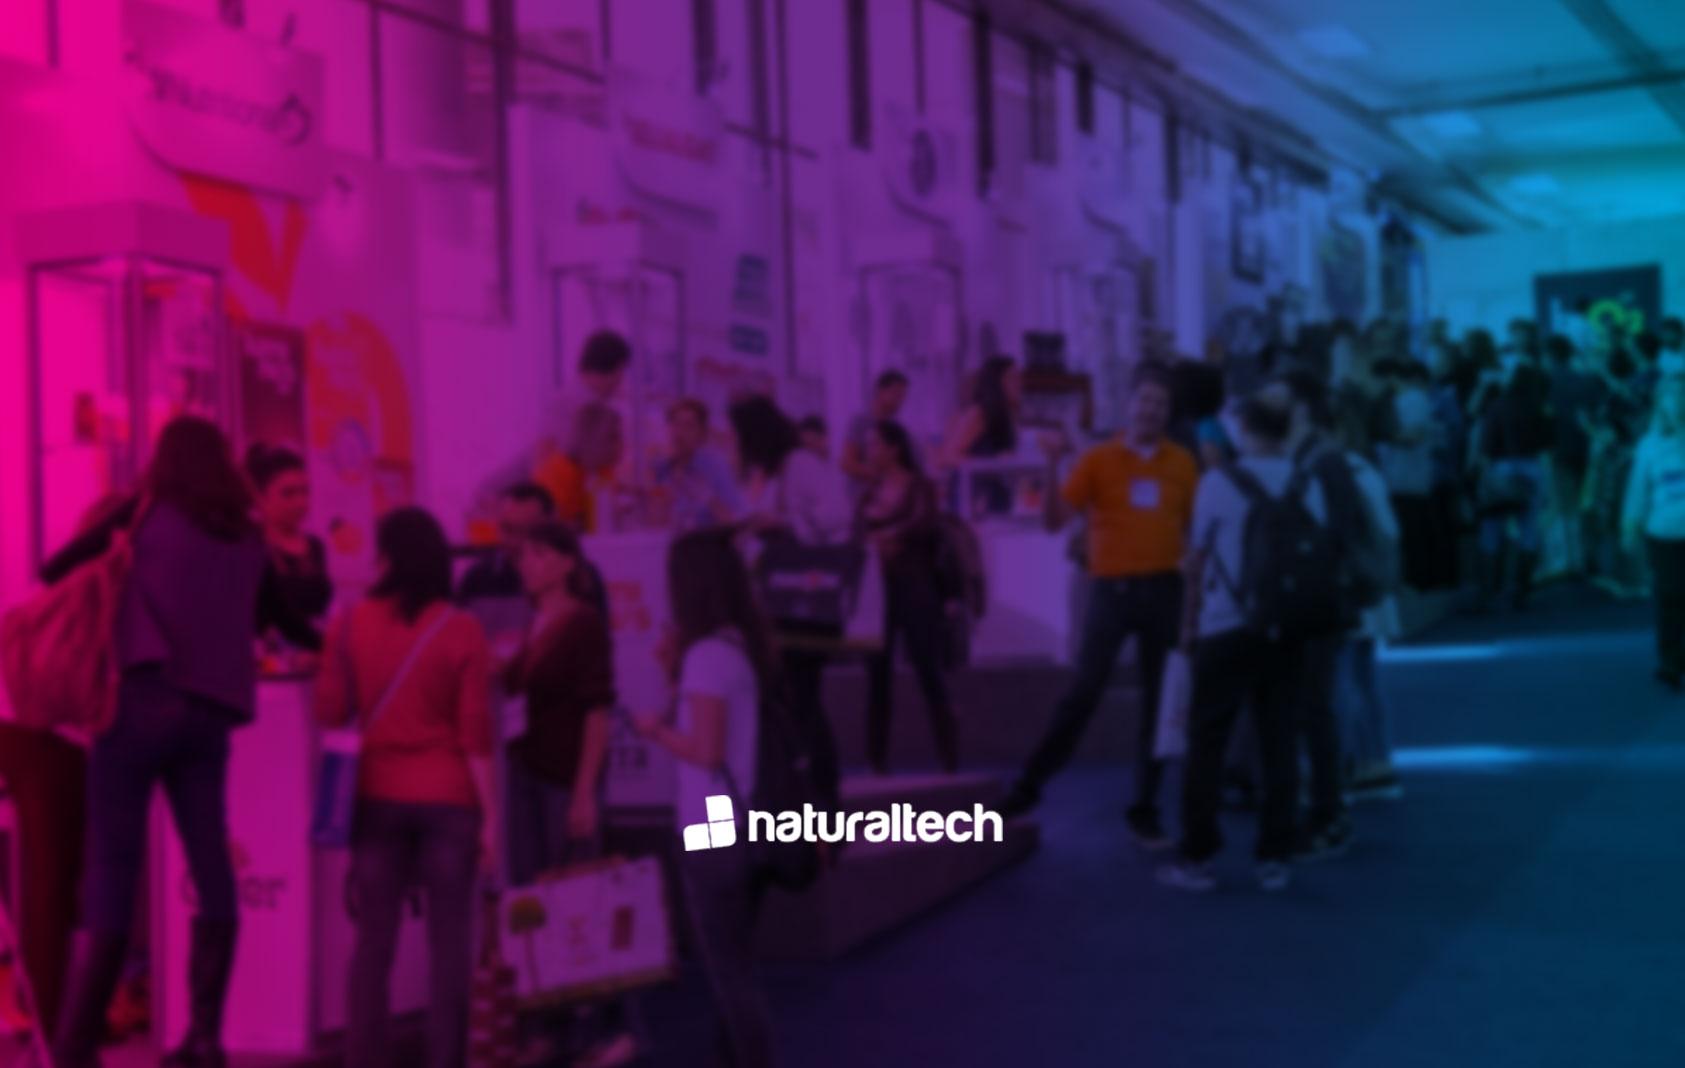 Paversul na Naturaltech